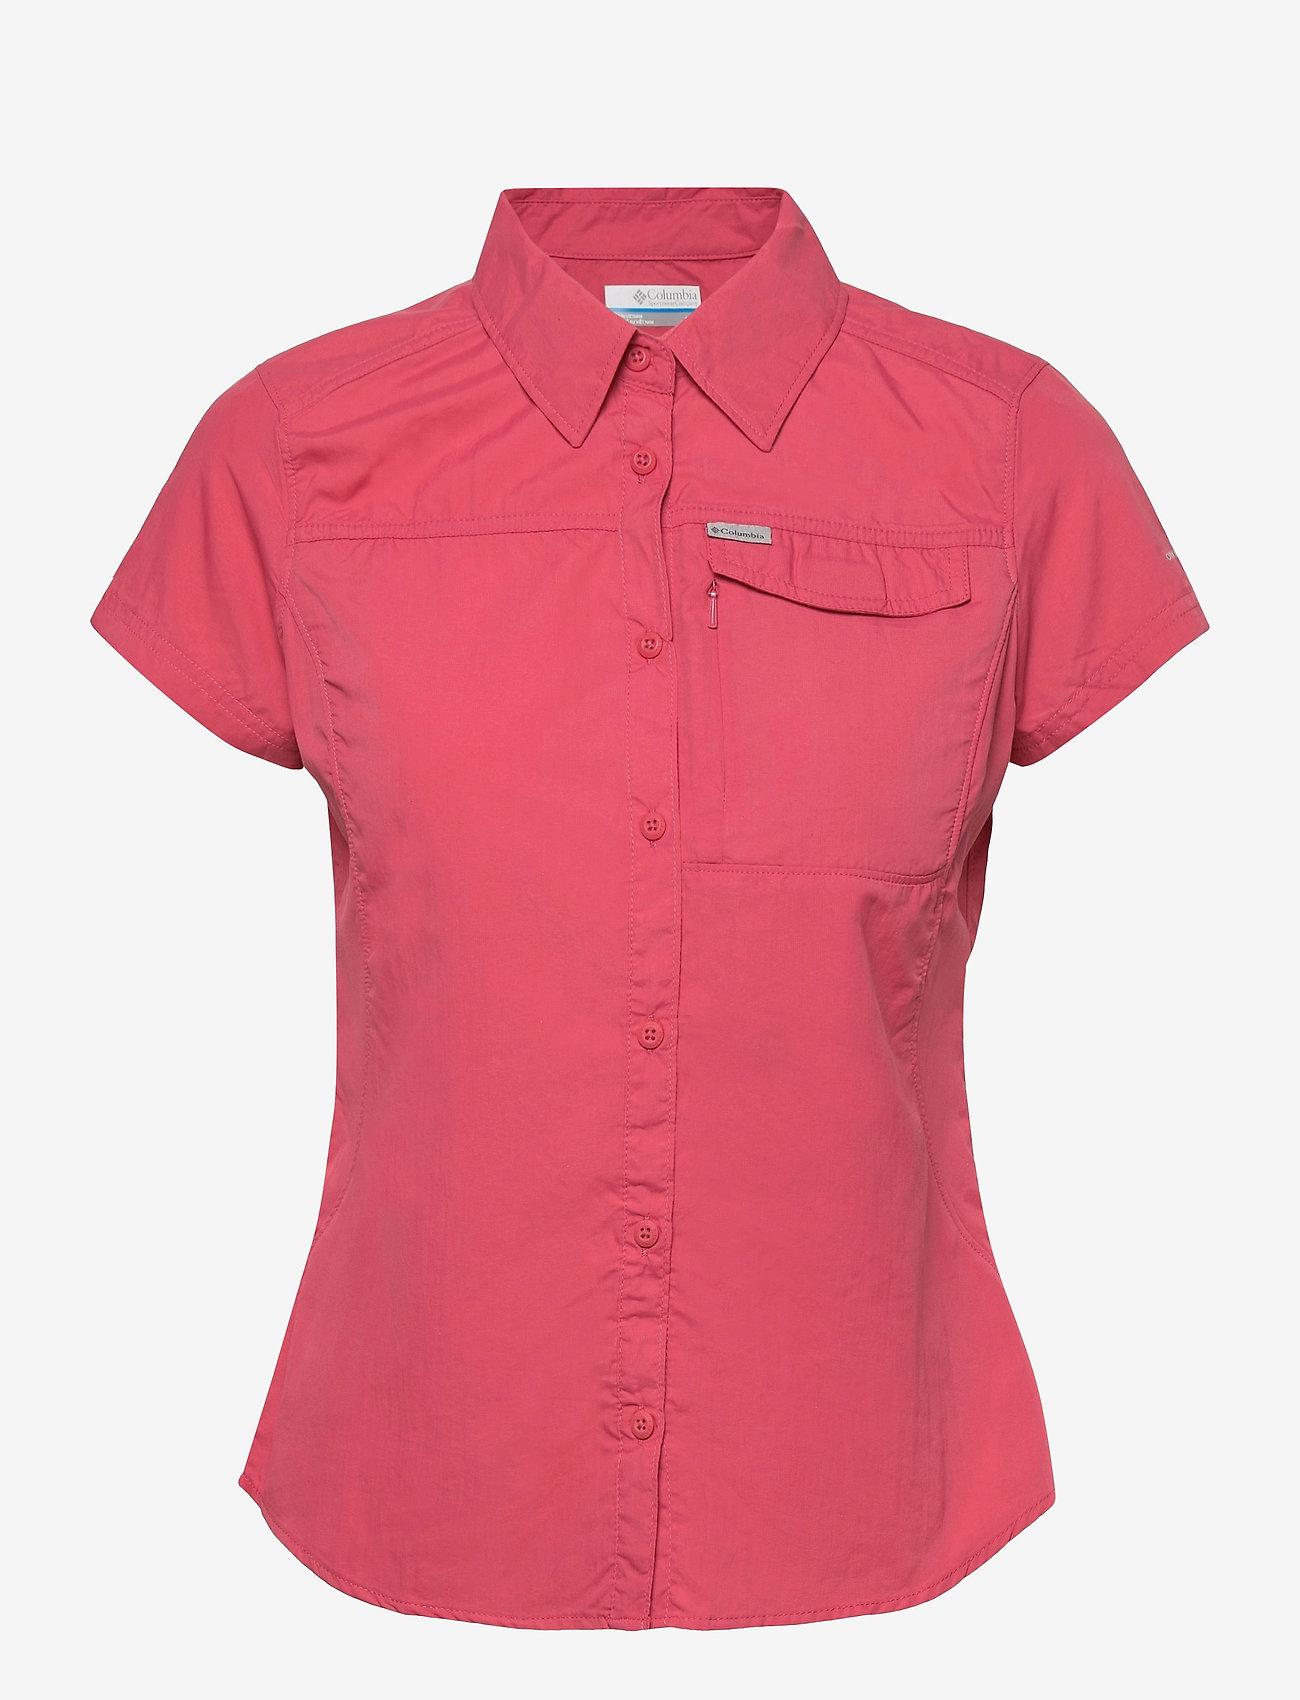 Columbia - Silver Ridge 2.0 Short Sleeve - koszule z krótkim rękawem - rouge pink - 0